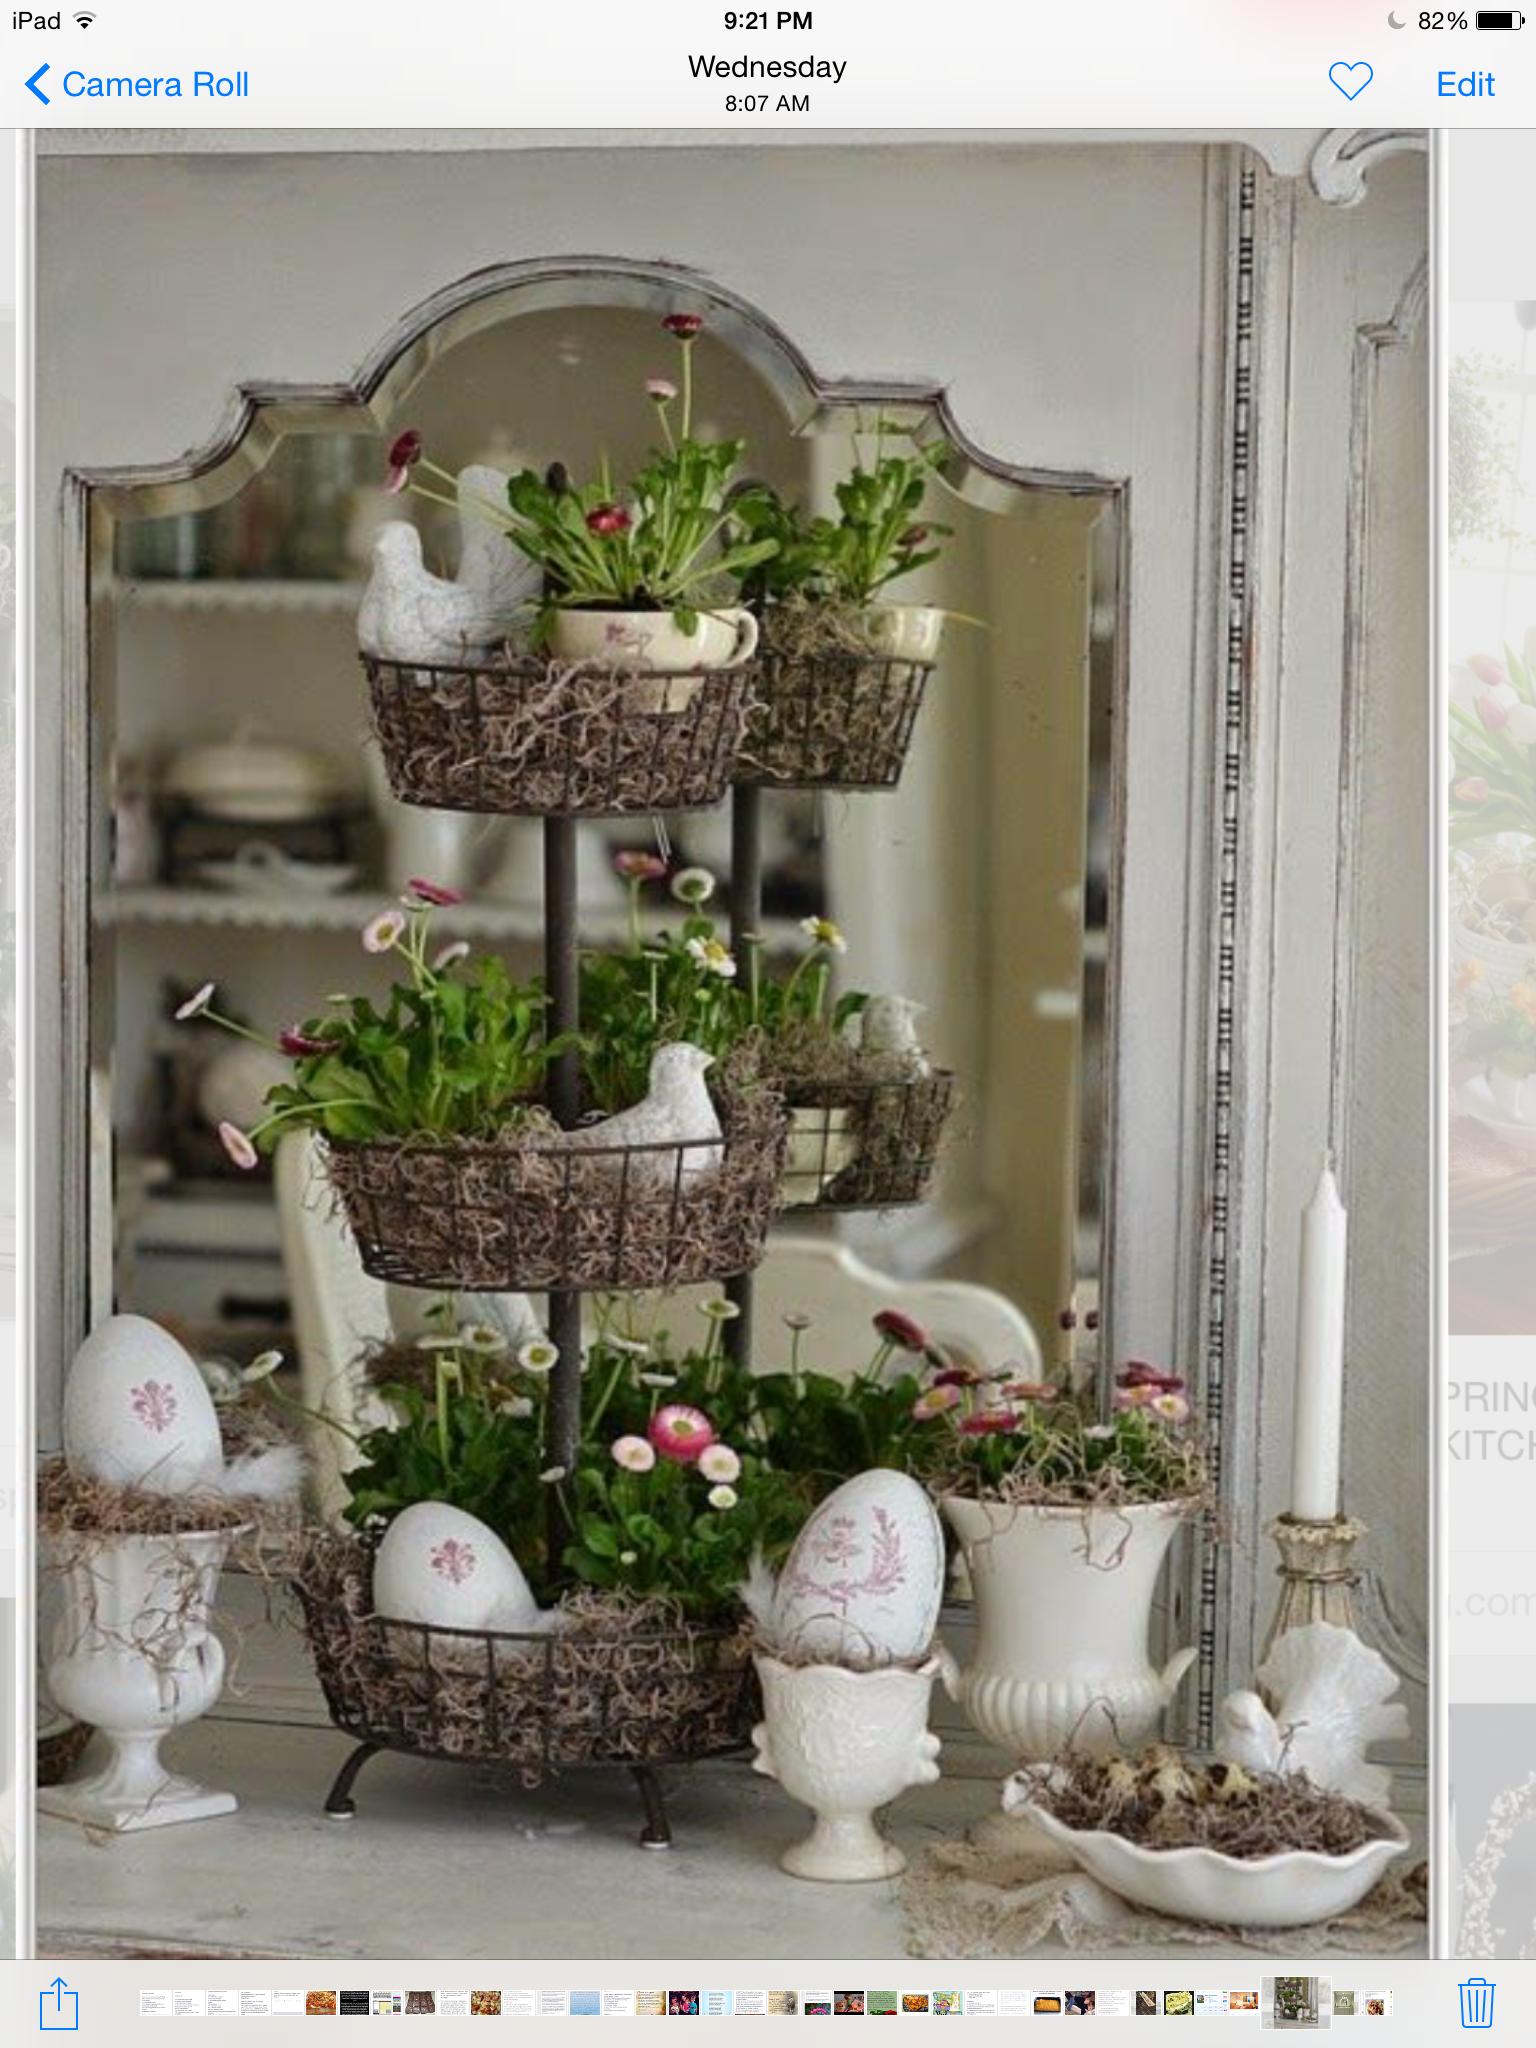 Pin by terrye smith on easter spring pinterest - Fensterbrett dekorieren ...